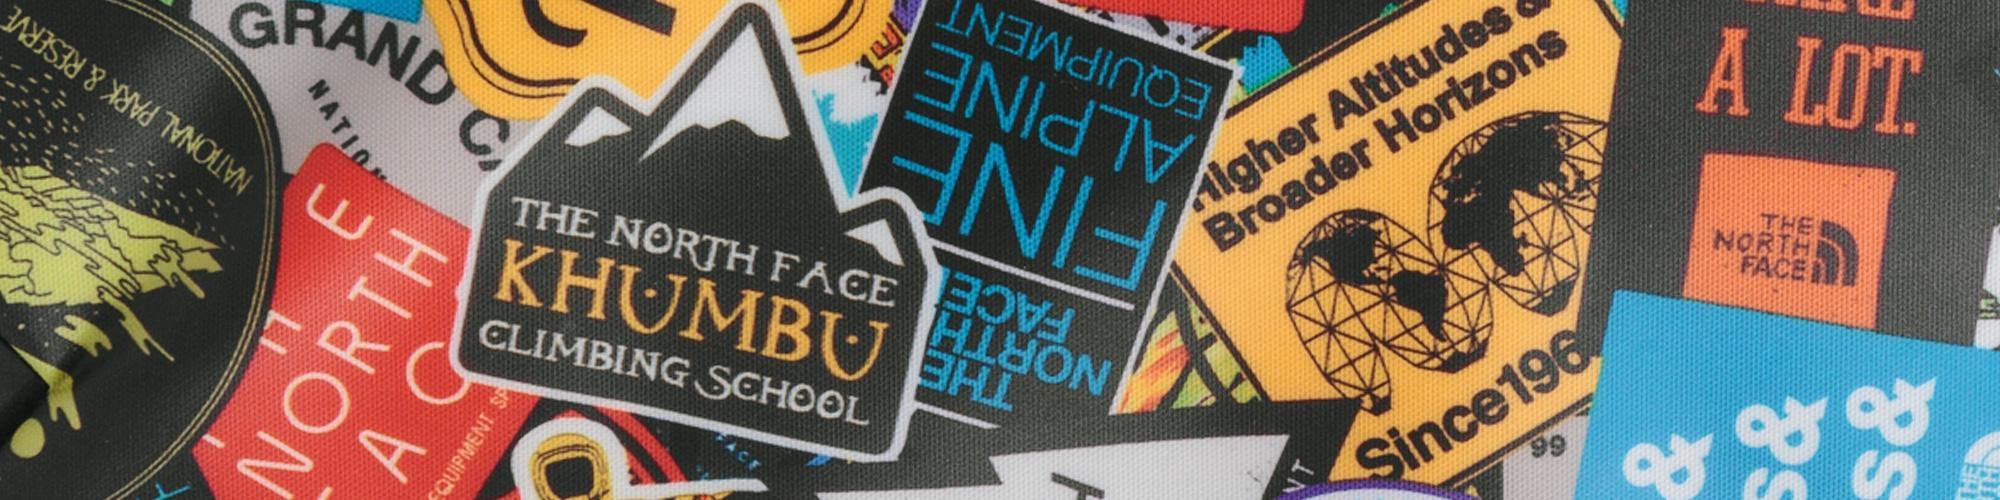 Banner Sticker Bomb